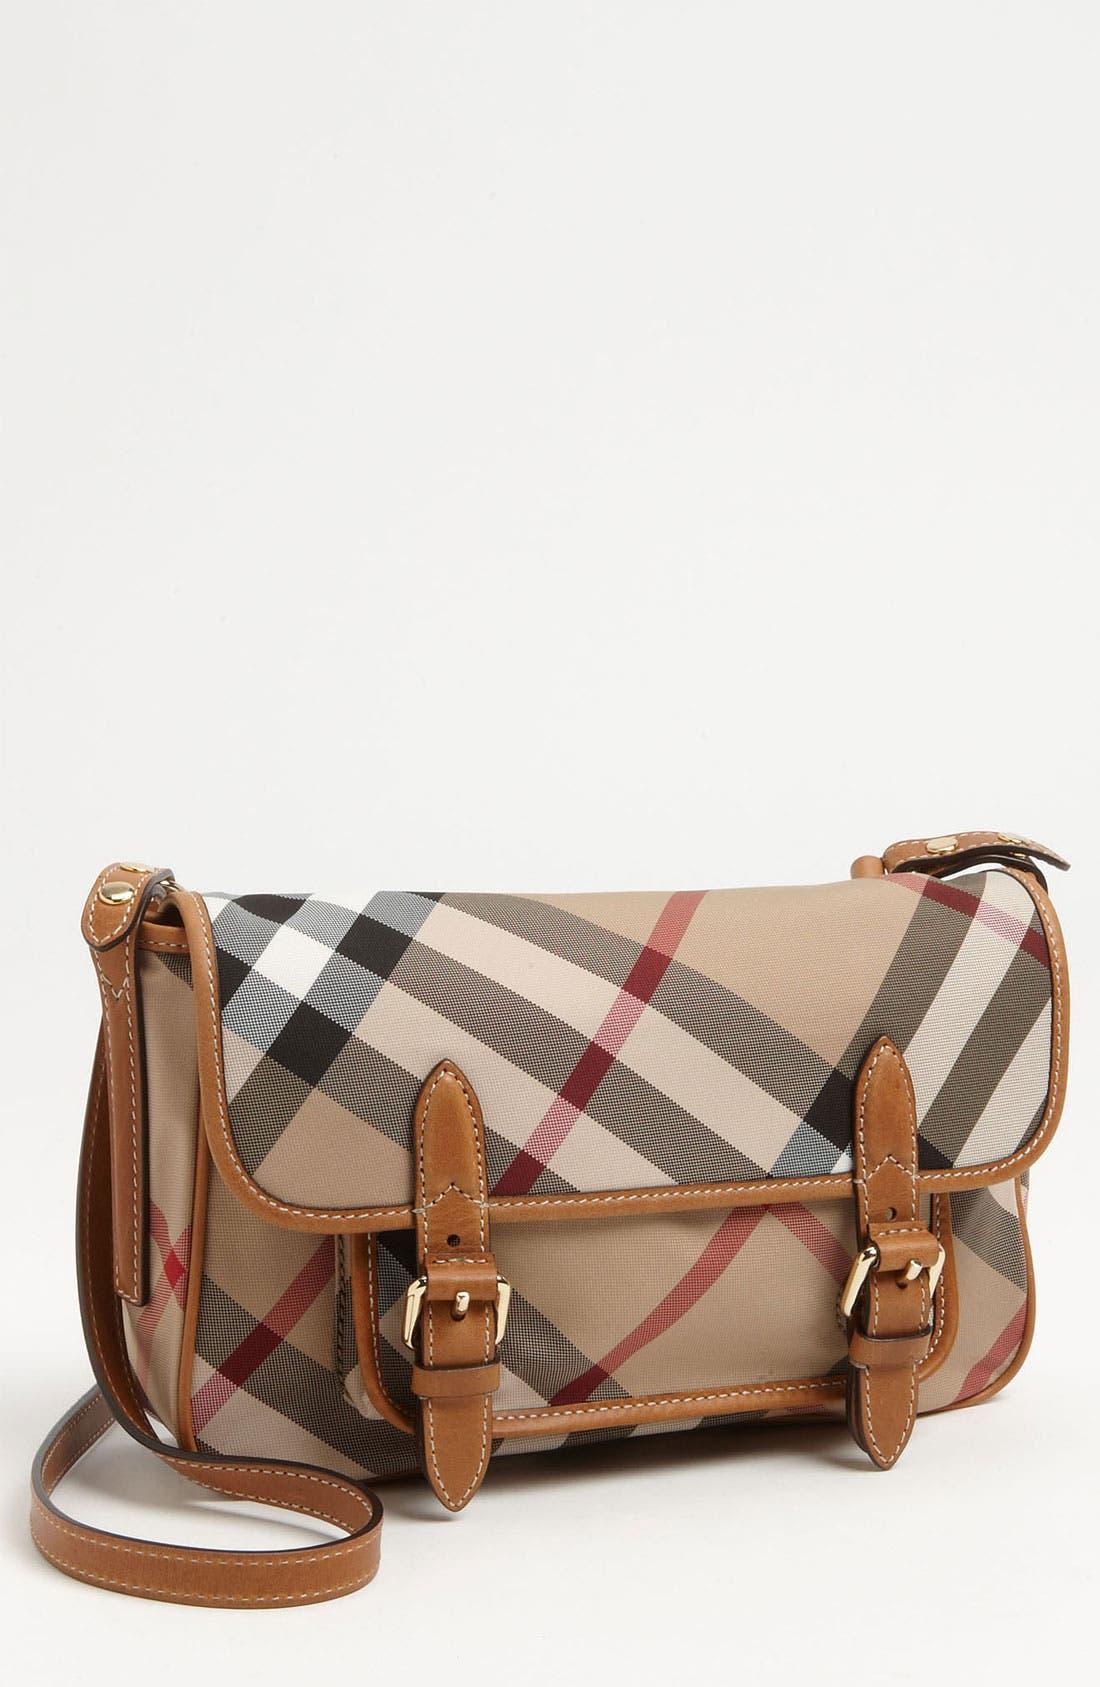 Main Image - Burberry 'Liv' Check Print Crossbody Bag (Girls)